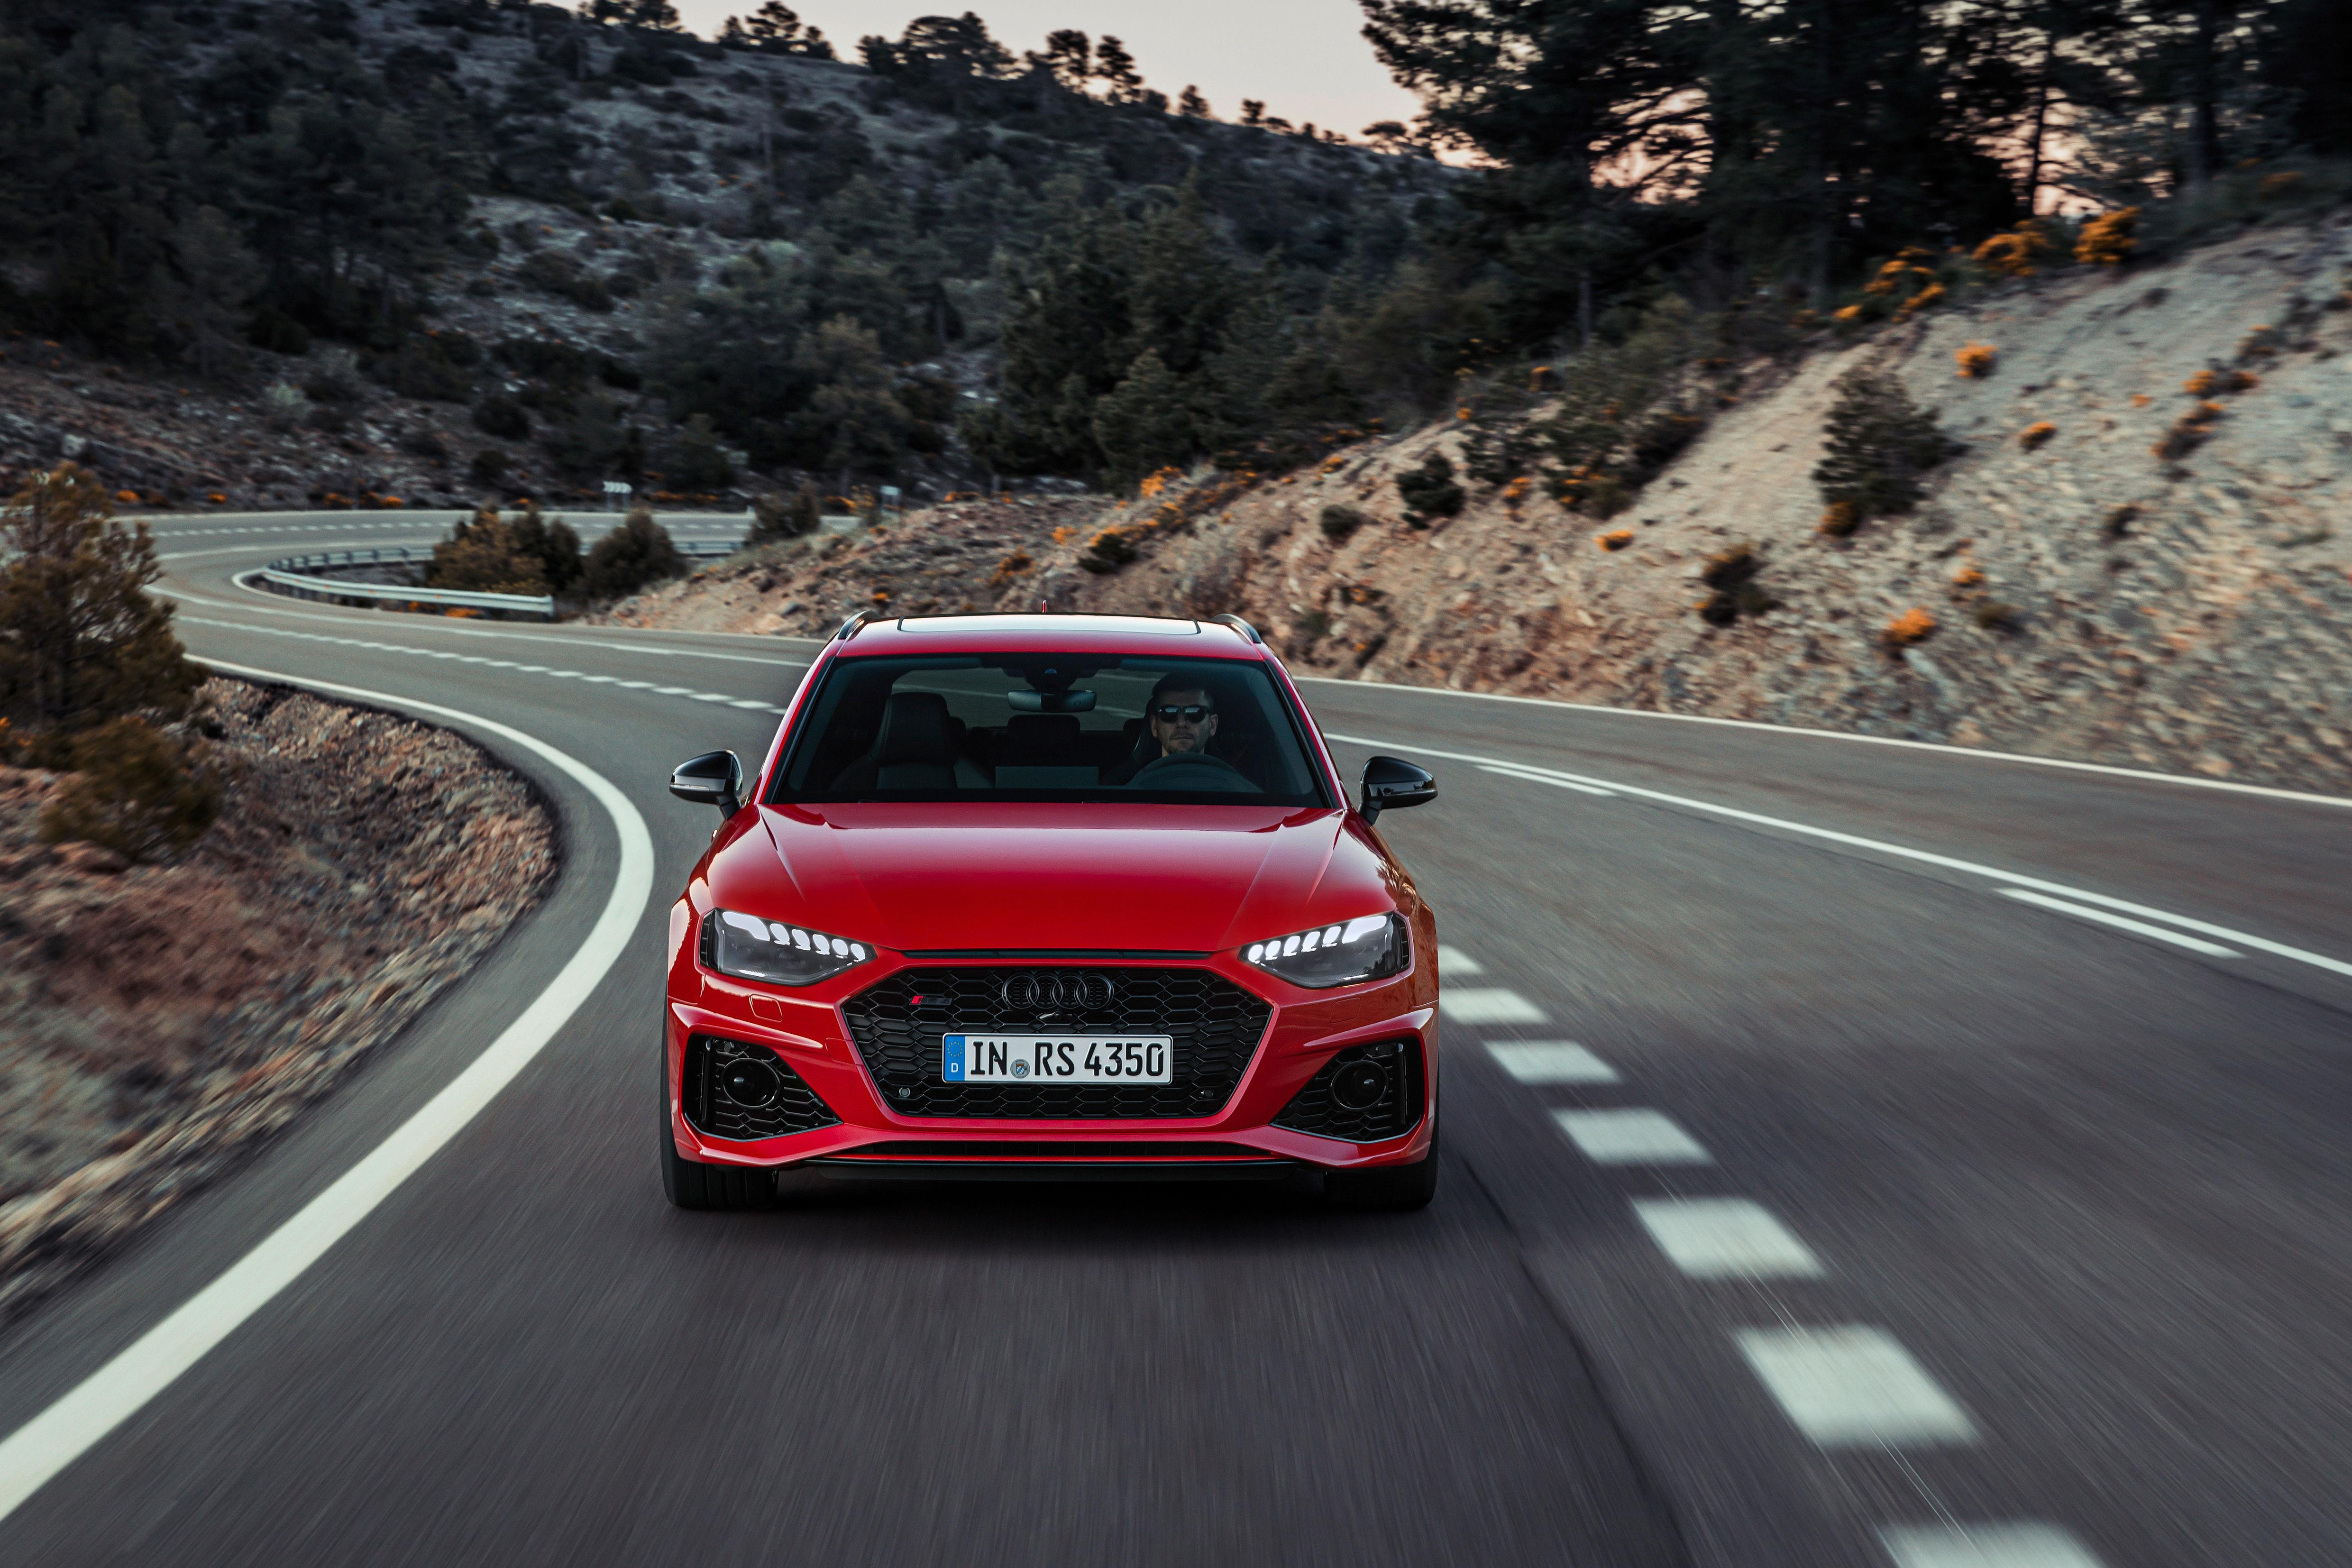 2020 Audi RS4 Avant Unveiled - ZigWheels